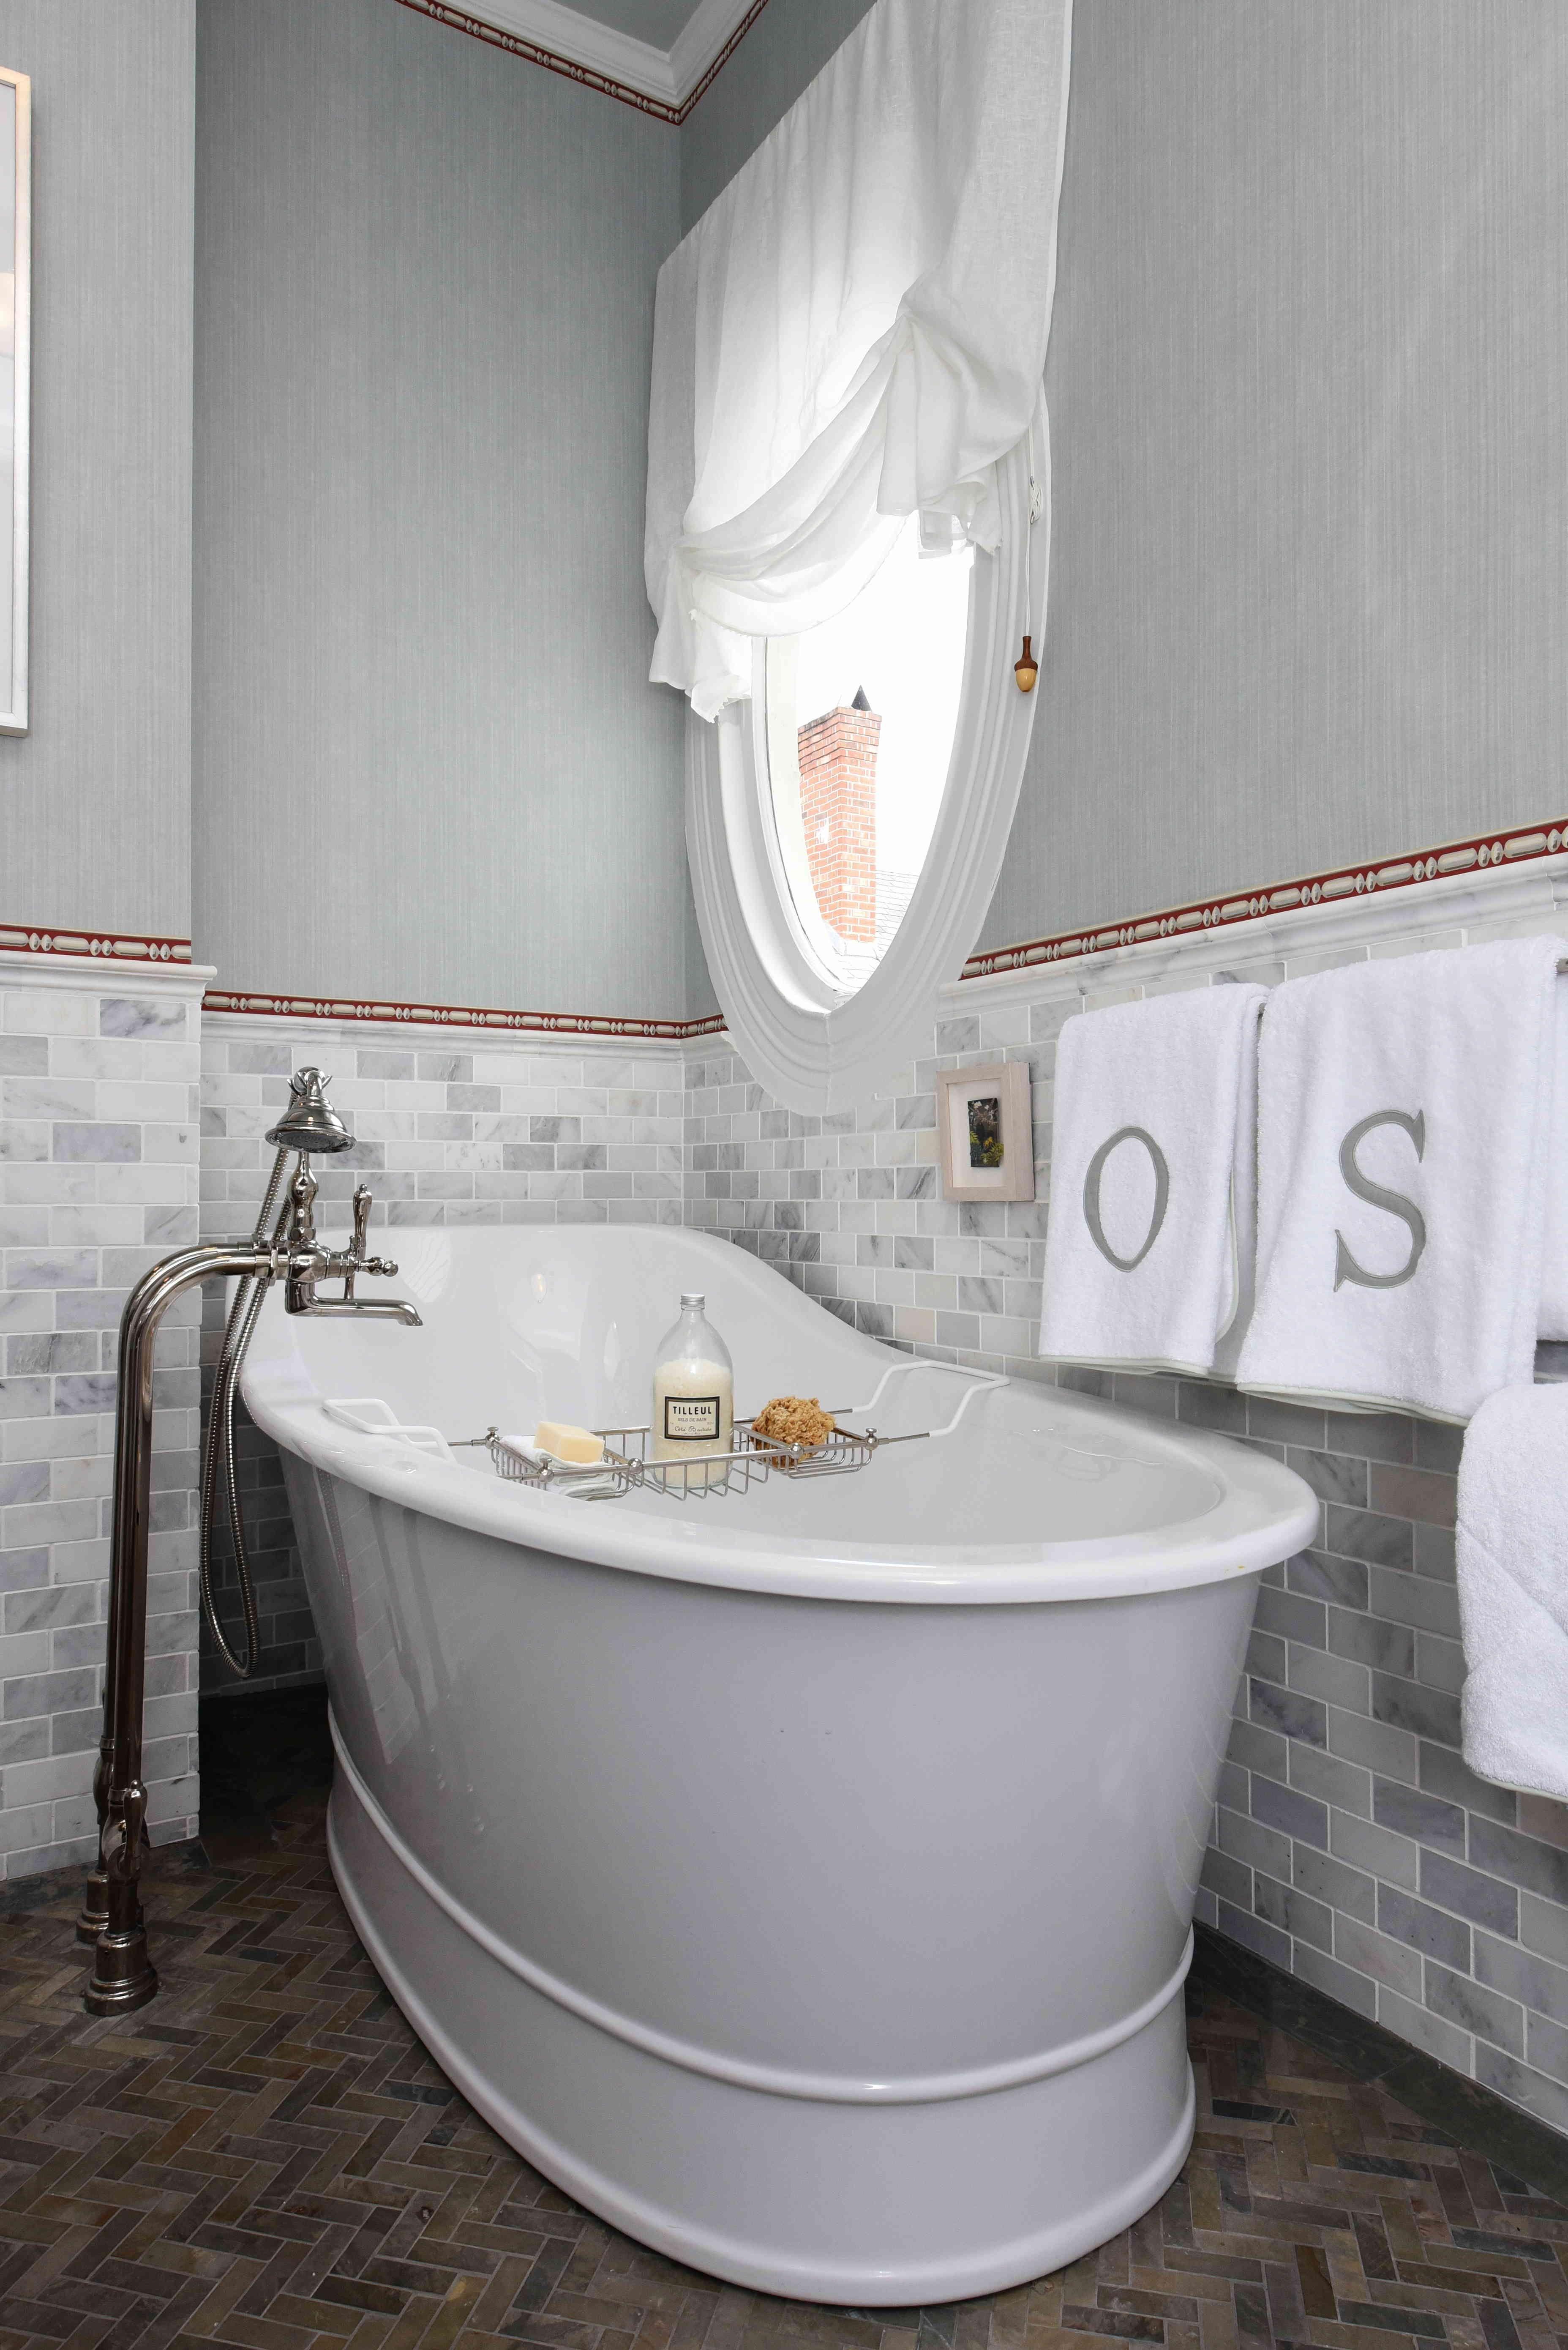 Second Floor Bathroom #2 by Olasky/Sinsteden featuring Oak Hill ...